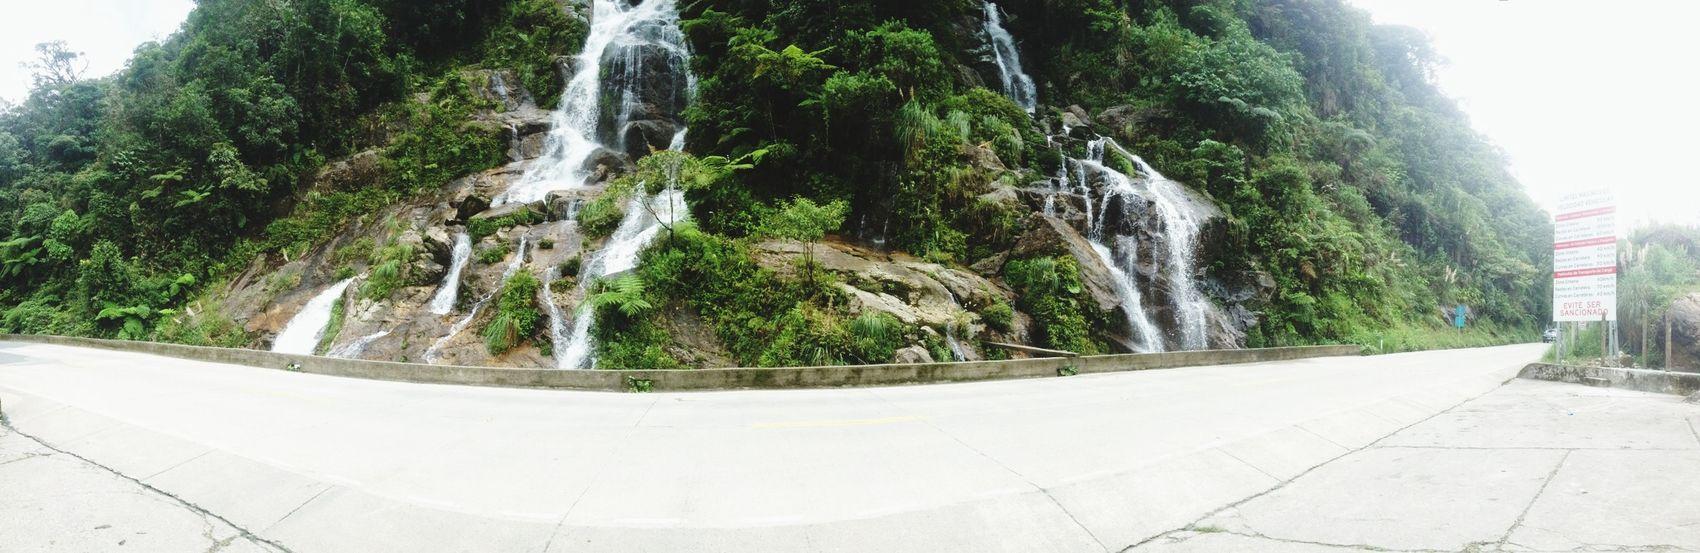 Taking Photos RoadZamoraNature